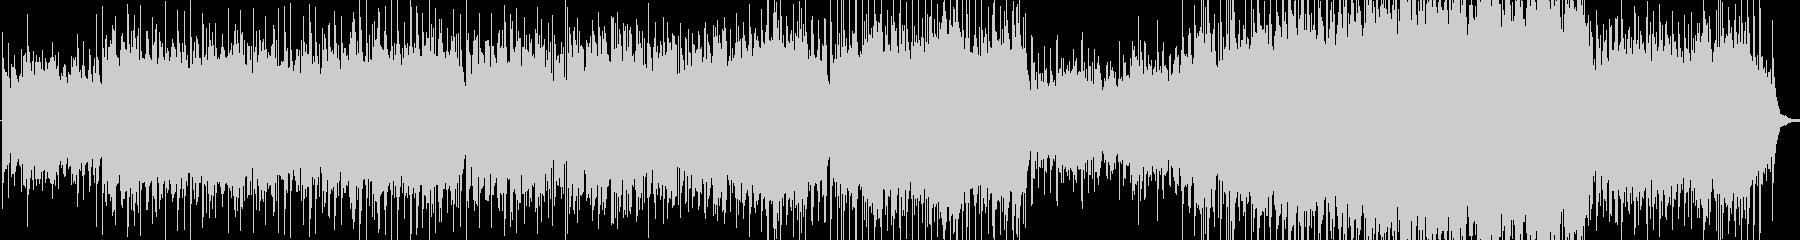 Pluto Lemonskyの未再生の波形